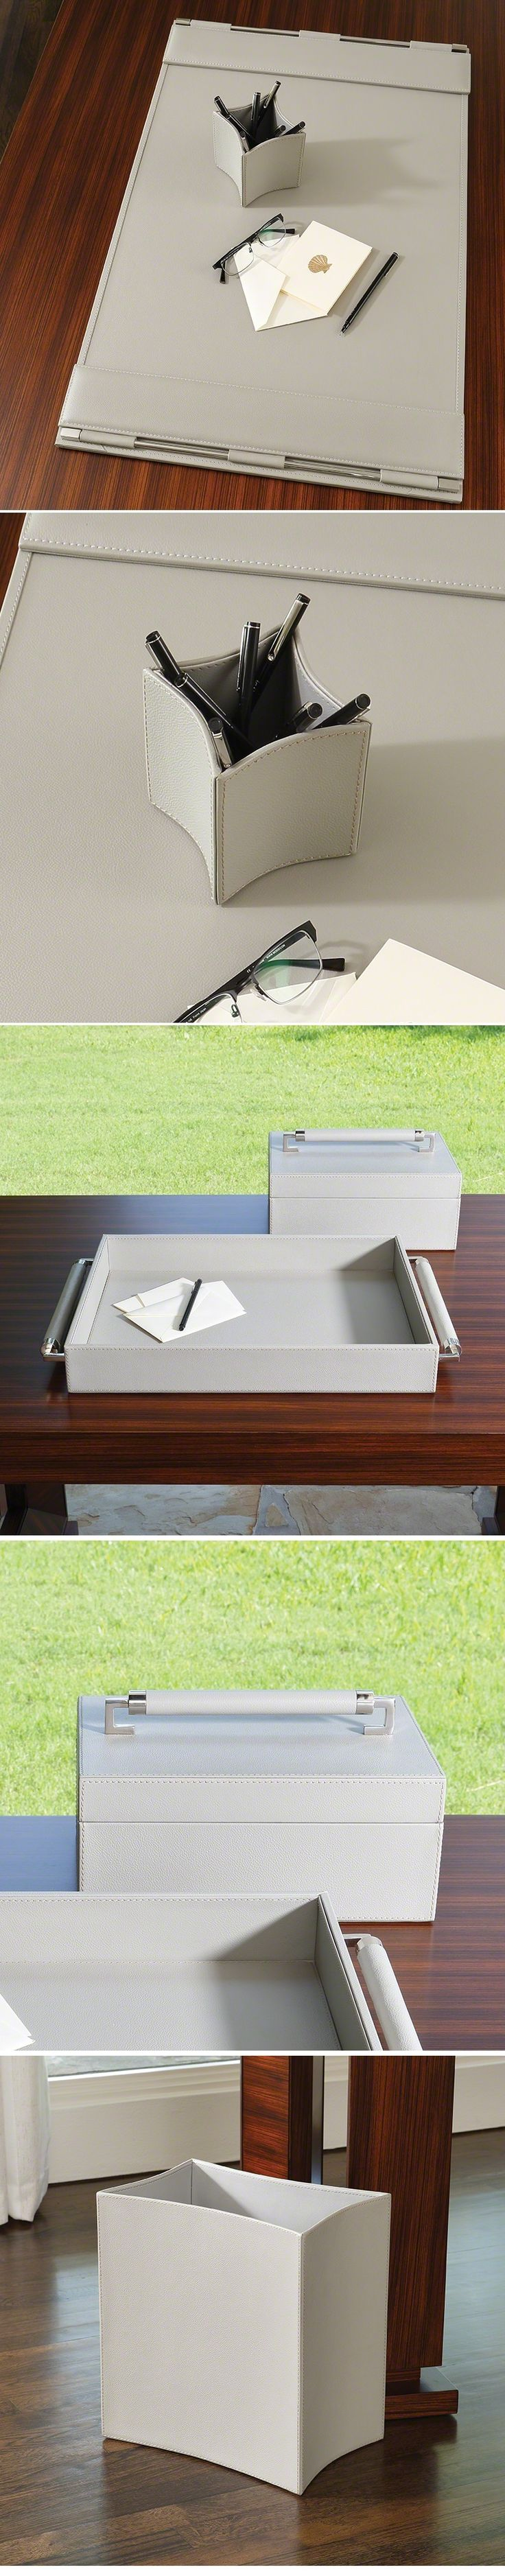 Home Office Ideas Design Desk Decor Set Accessory Accessories Pad Pads Writing